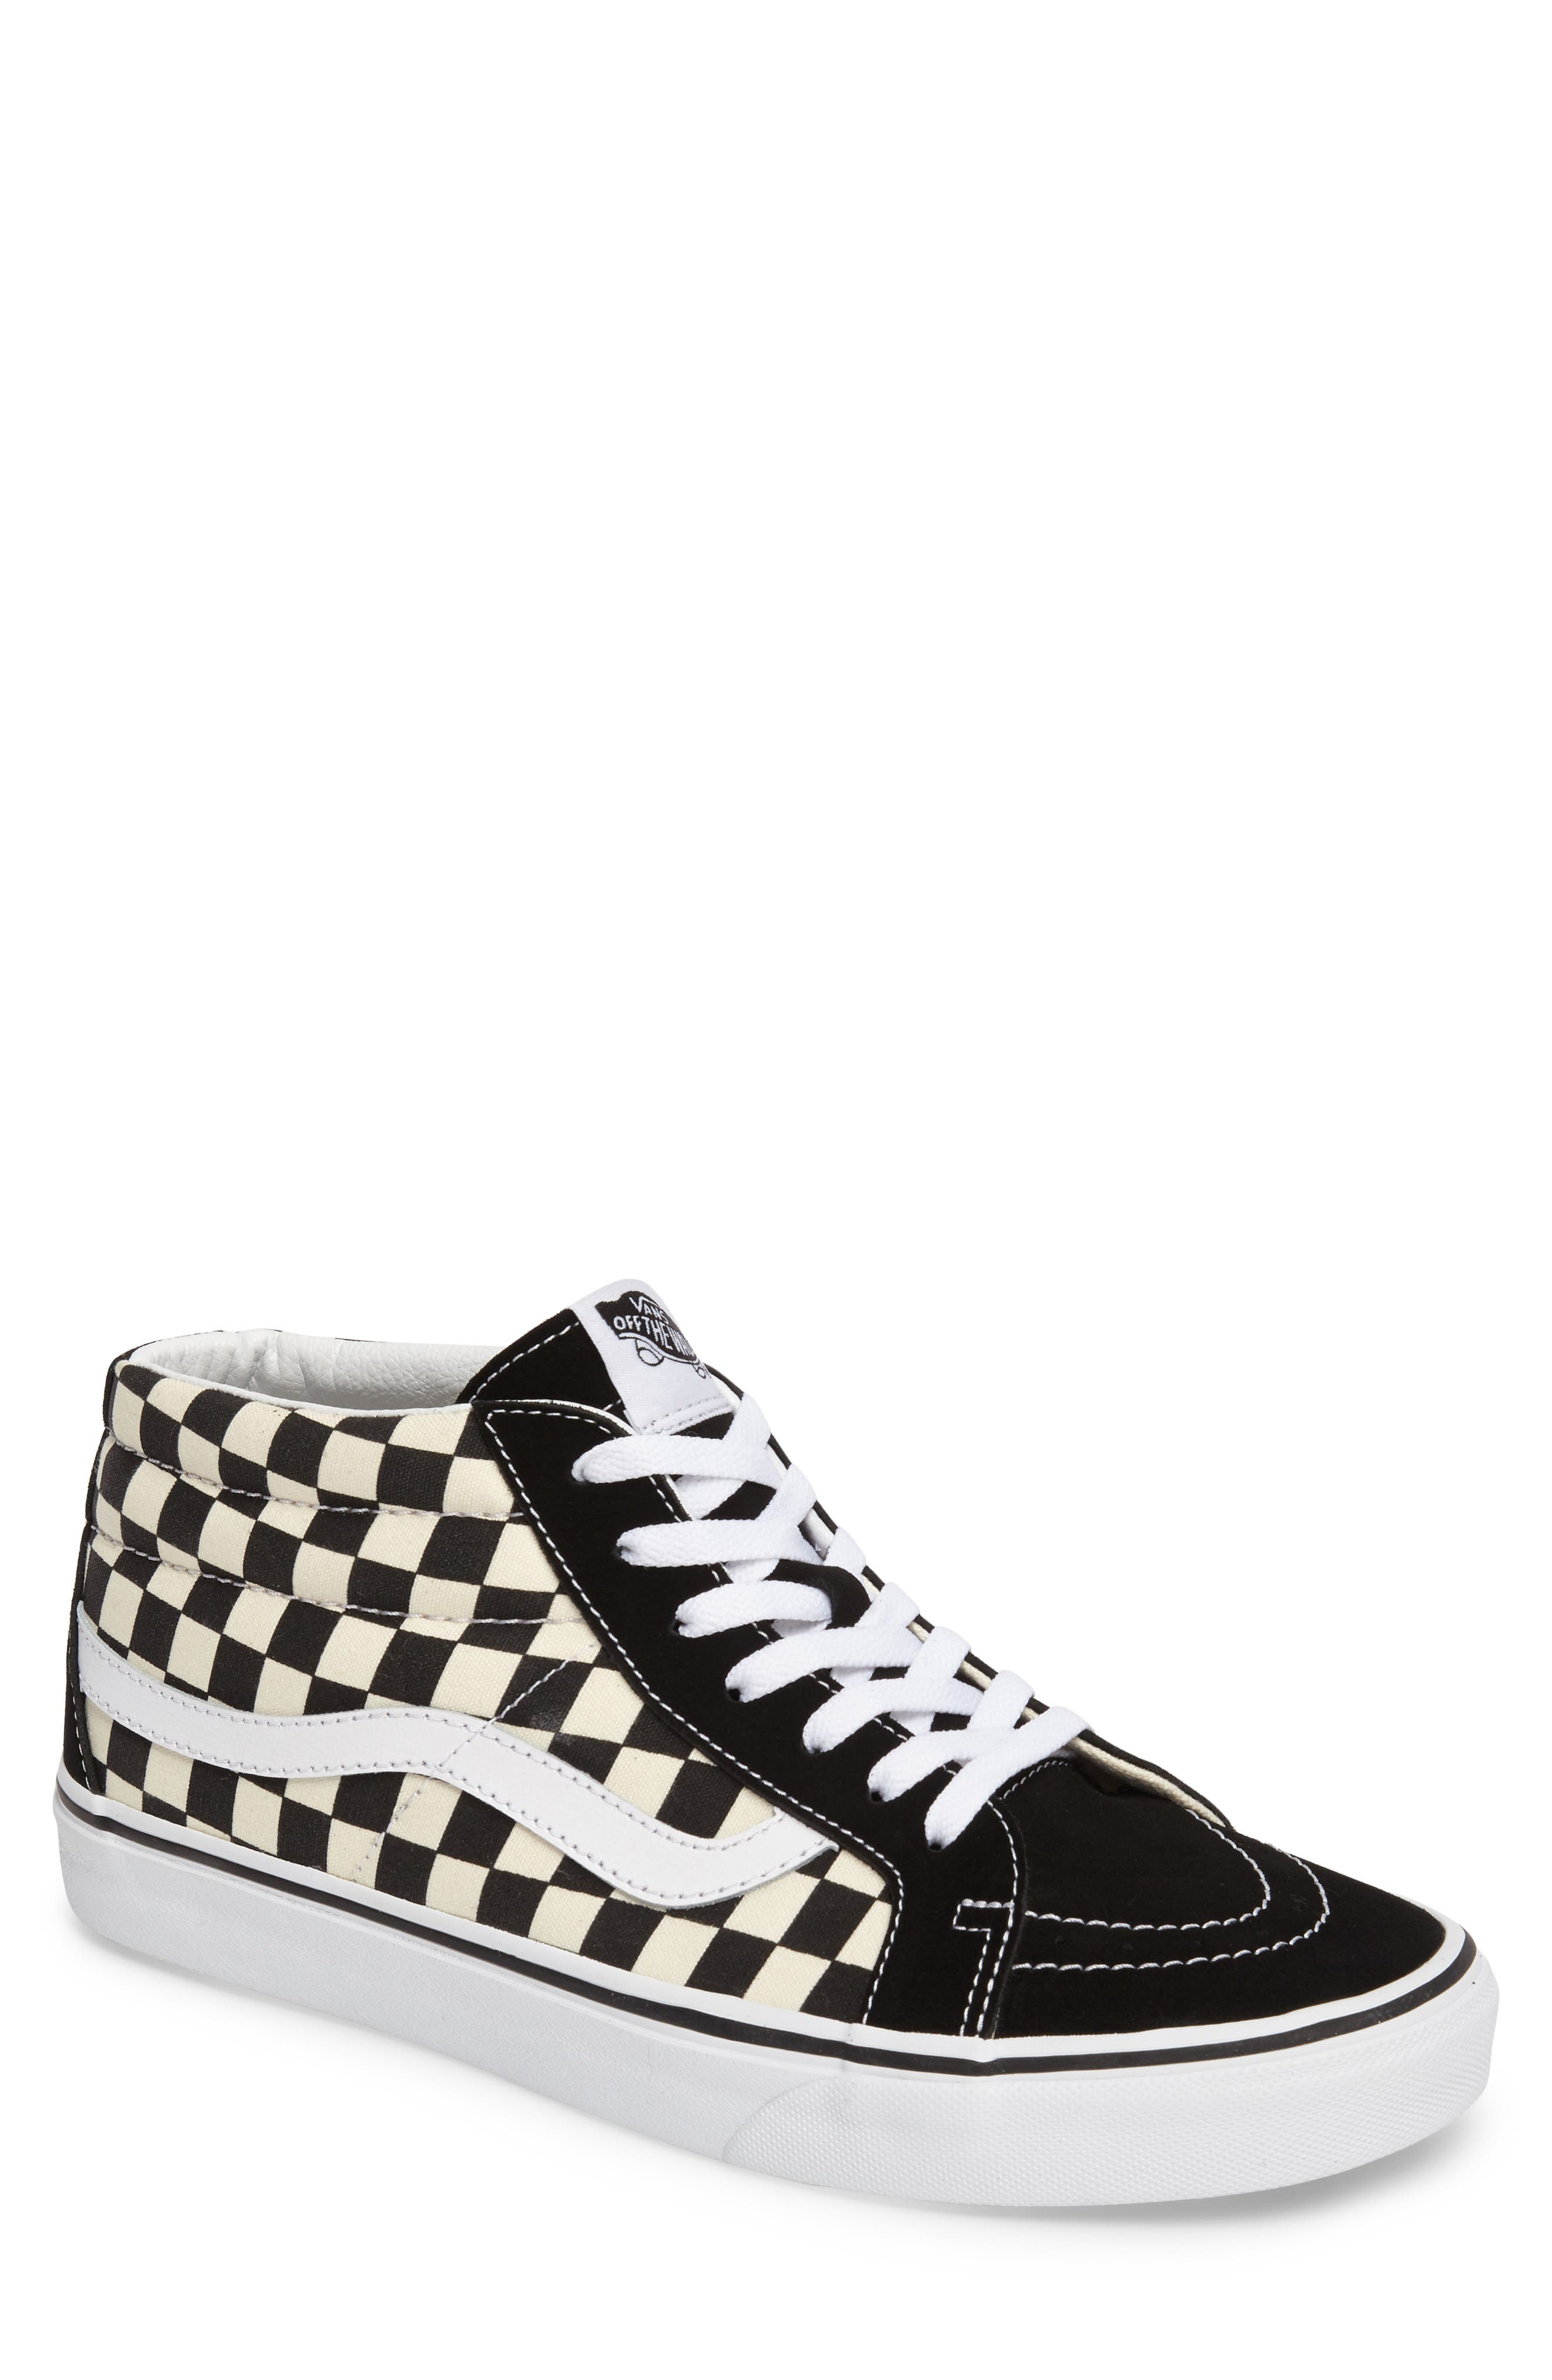 Sk8-Mid Reissue Sneaker,                         Main,                         color, White Checker Canvas/ Suede